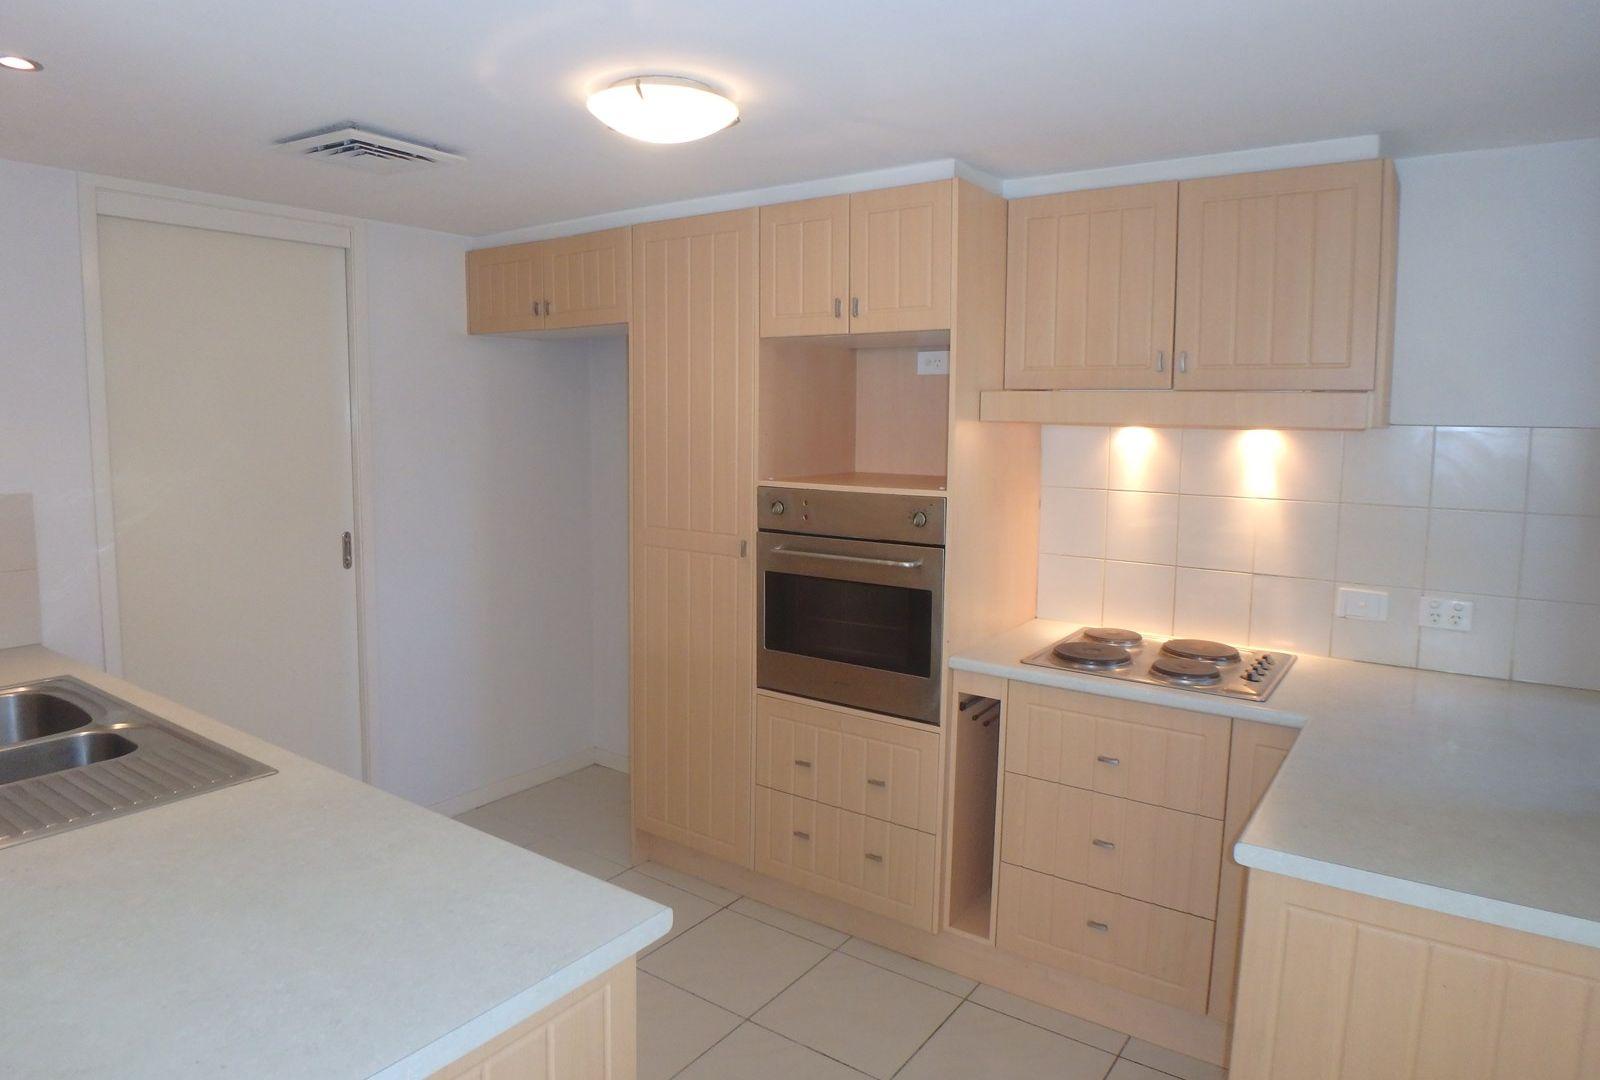 2/101 Ekibin Road, Annerley QLD 4103, Image 1